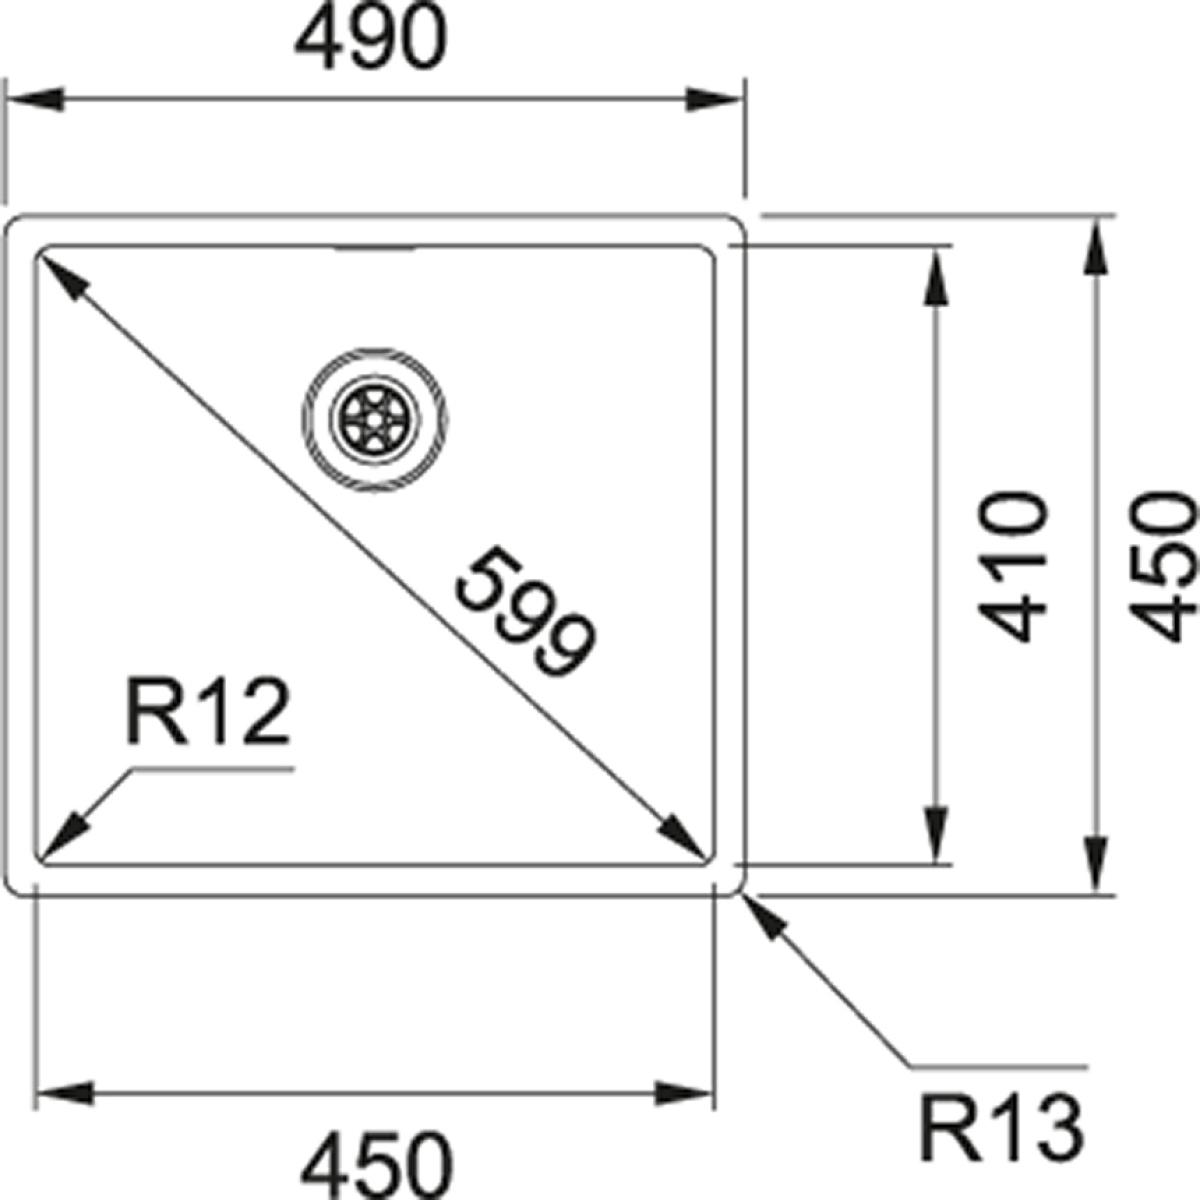 franke box bxx210 45 druckknopf ventil g nstig kaufen. Black Bedroom Furniture Sets. Home Design Ideas